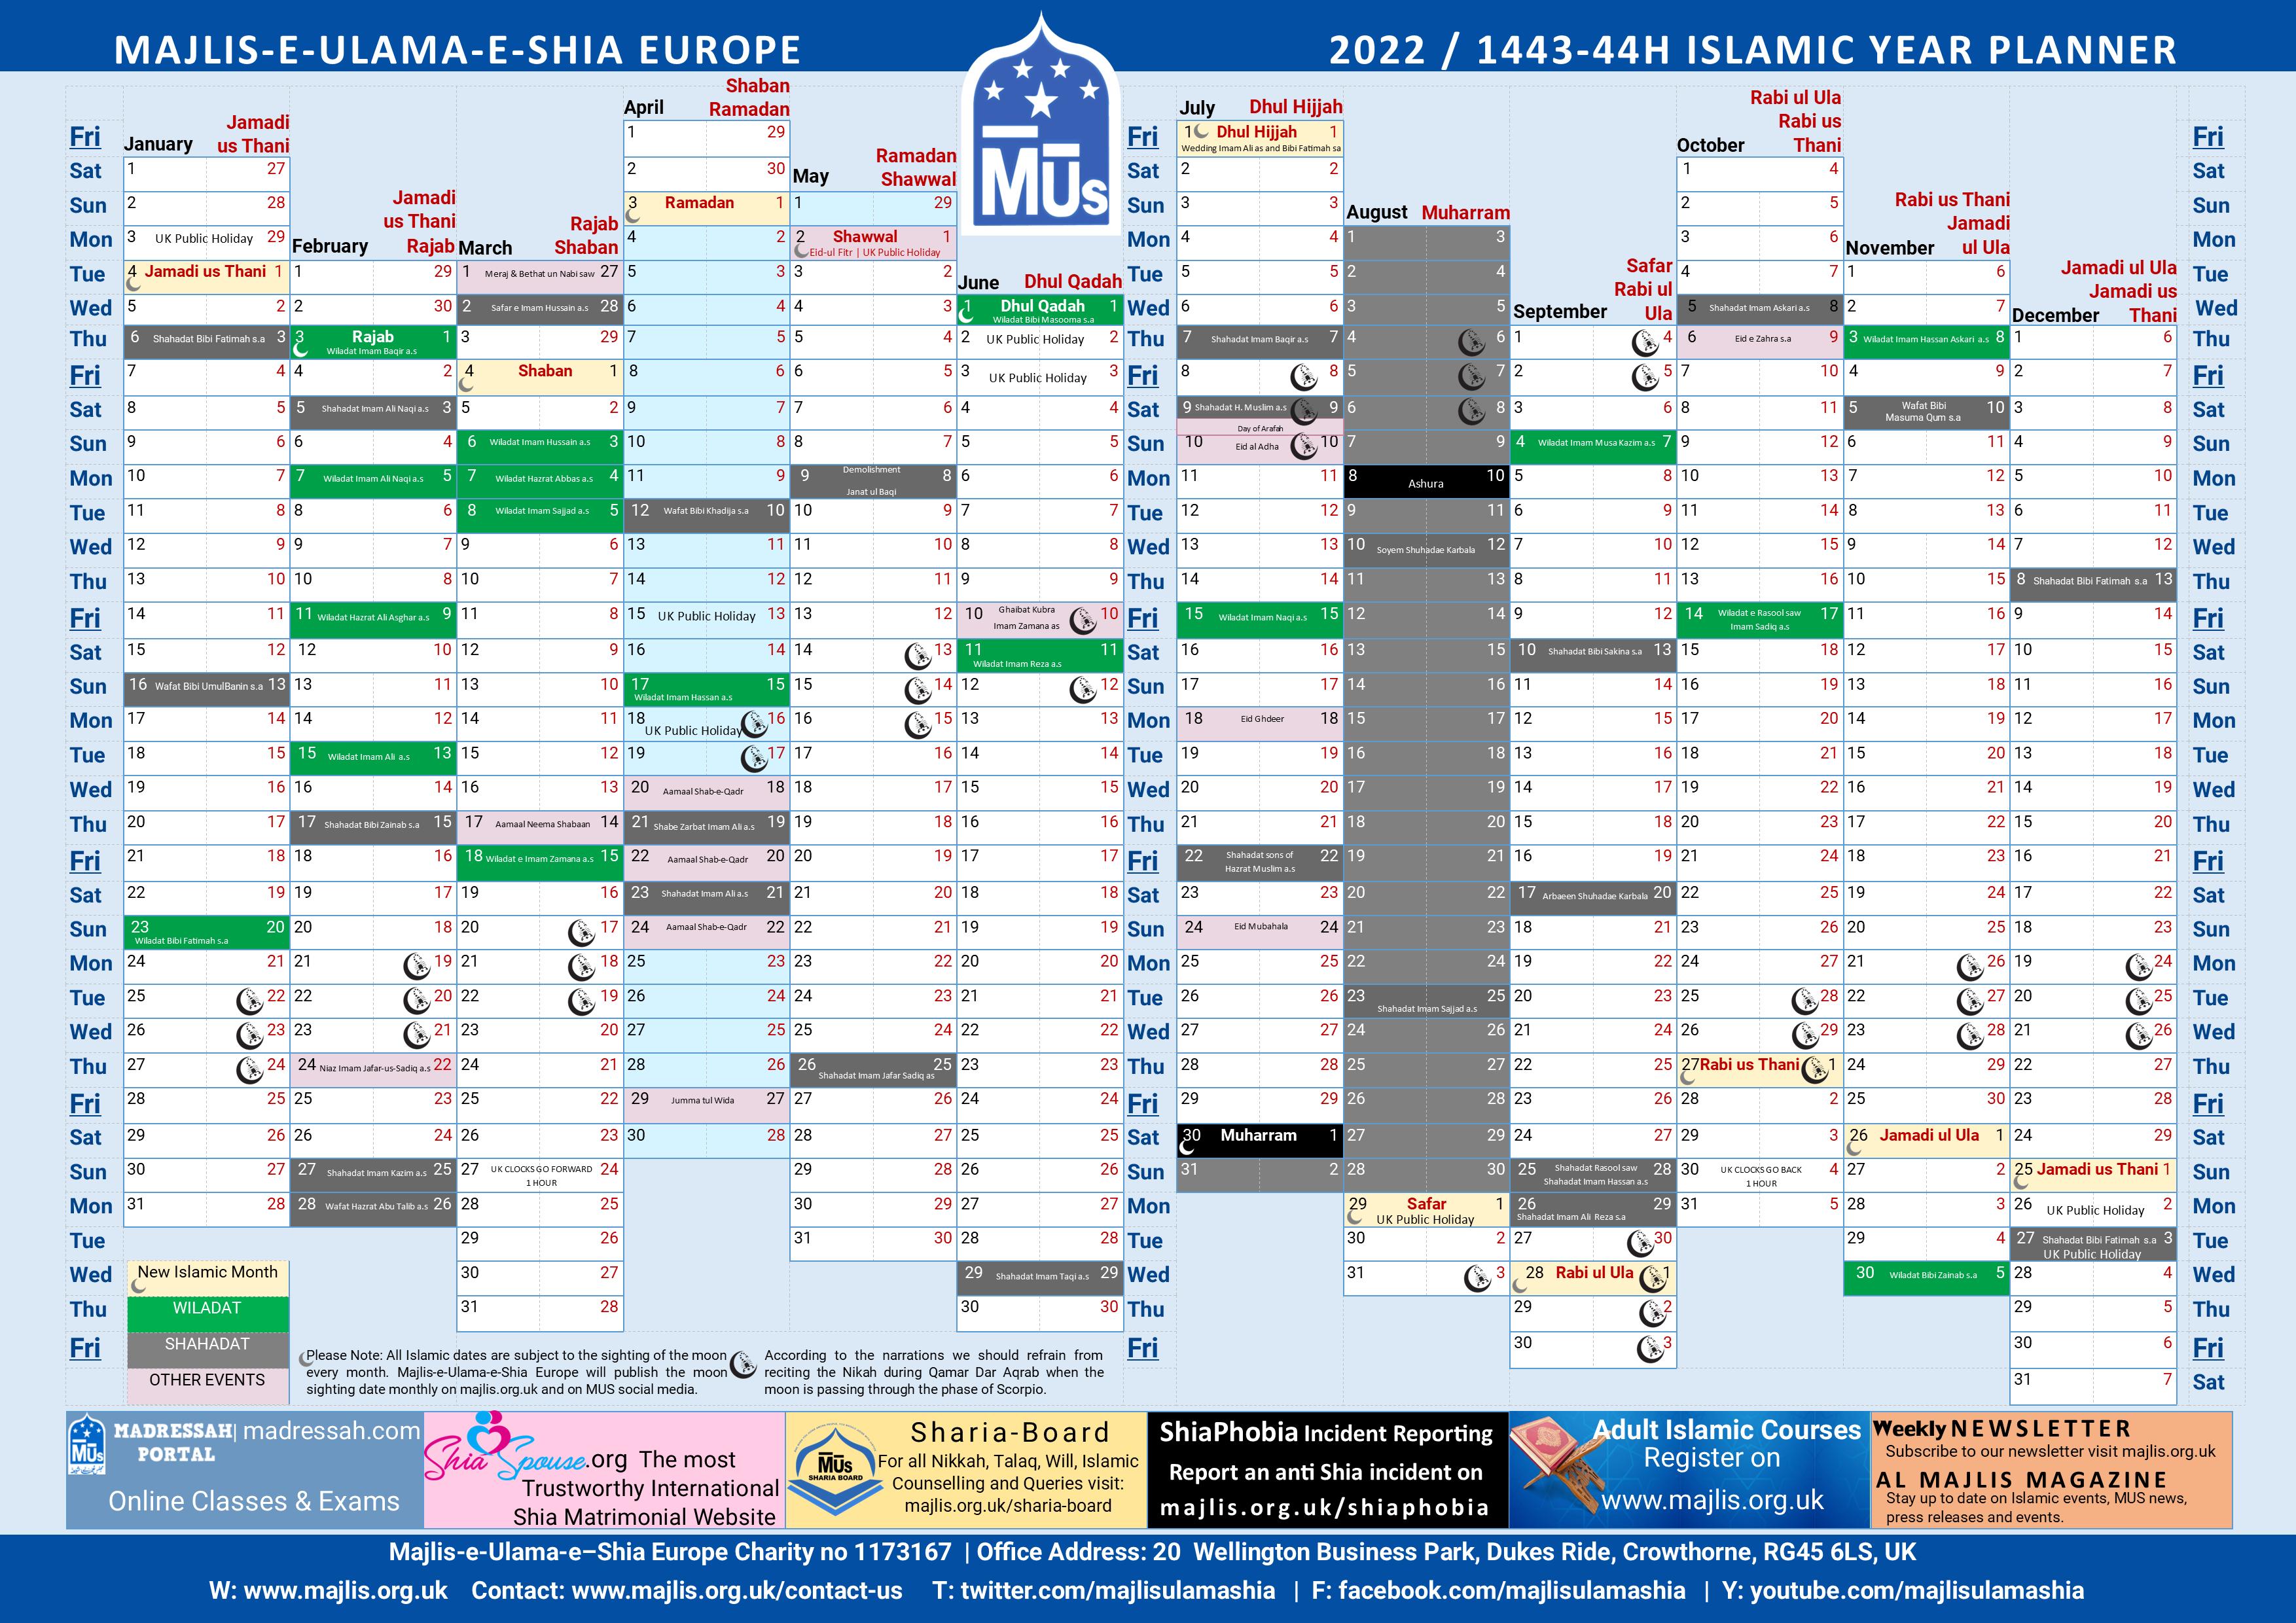 Shia Islamic Calendar 2022